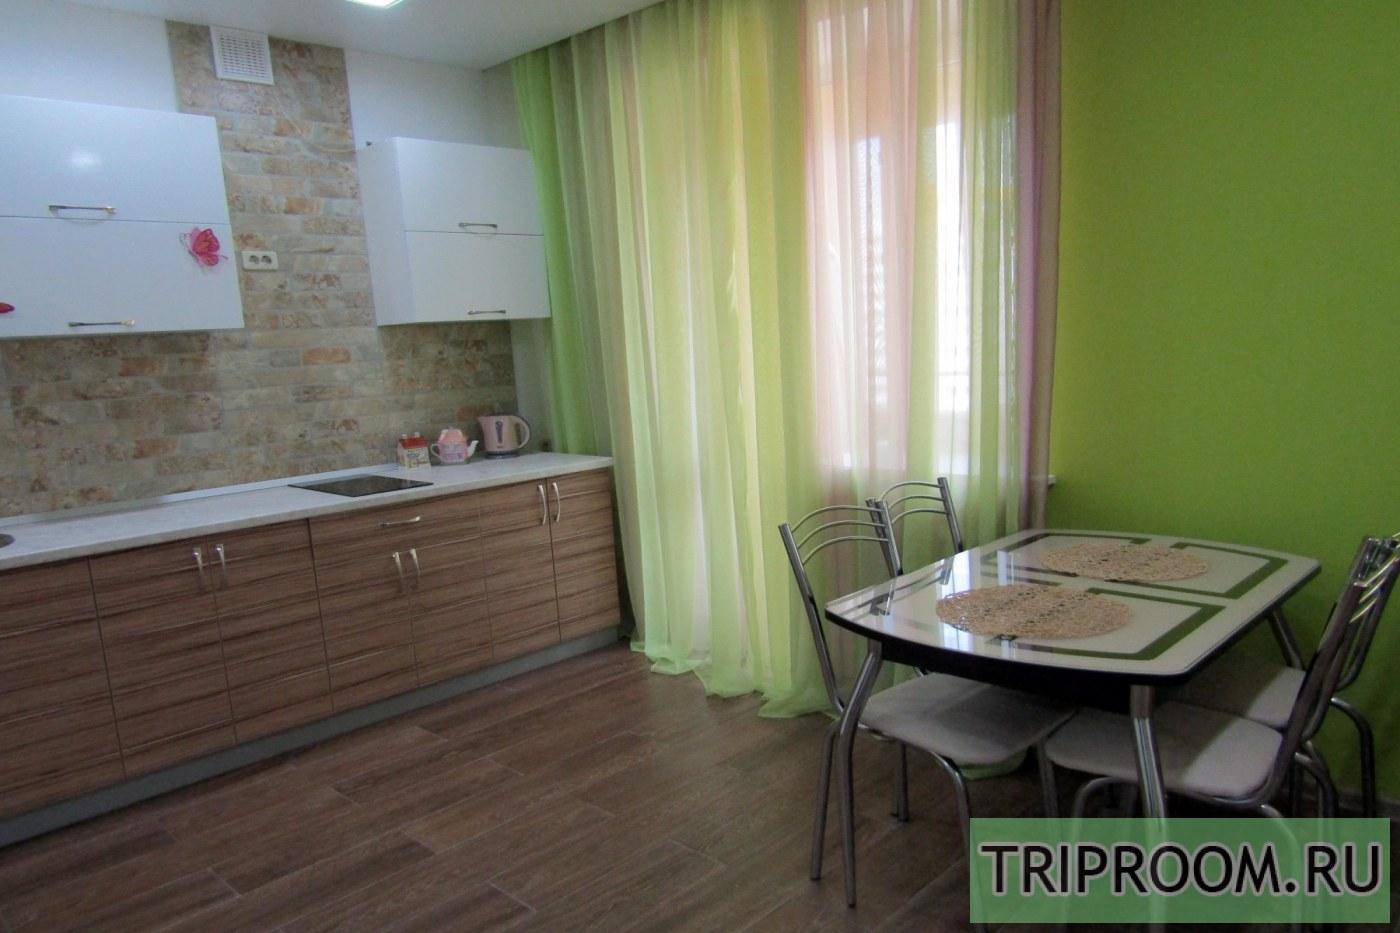 1-комнатная квартира посуточно (вариант № 37389), ул. Лозицкой улица, фото № 3